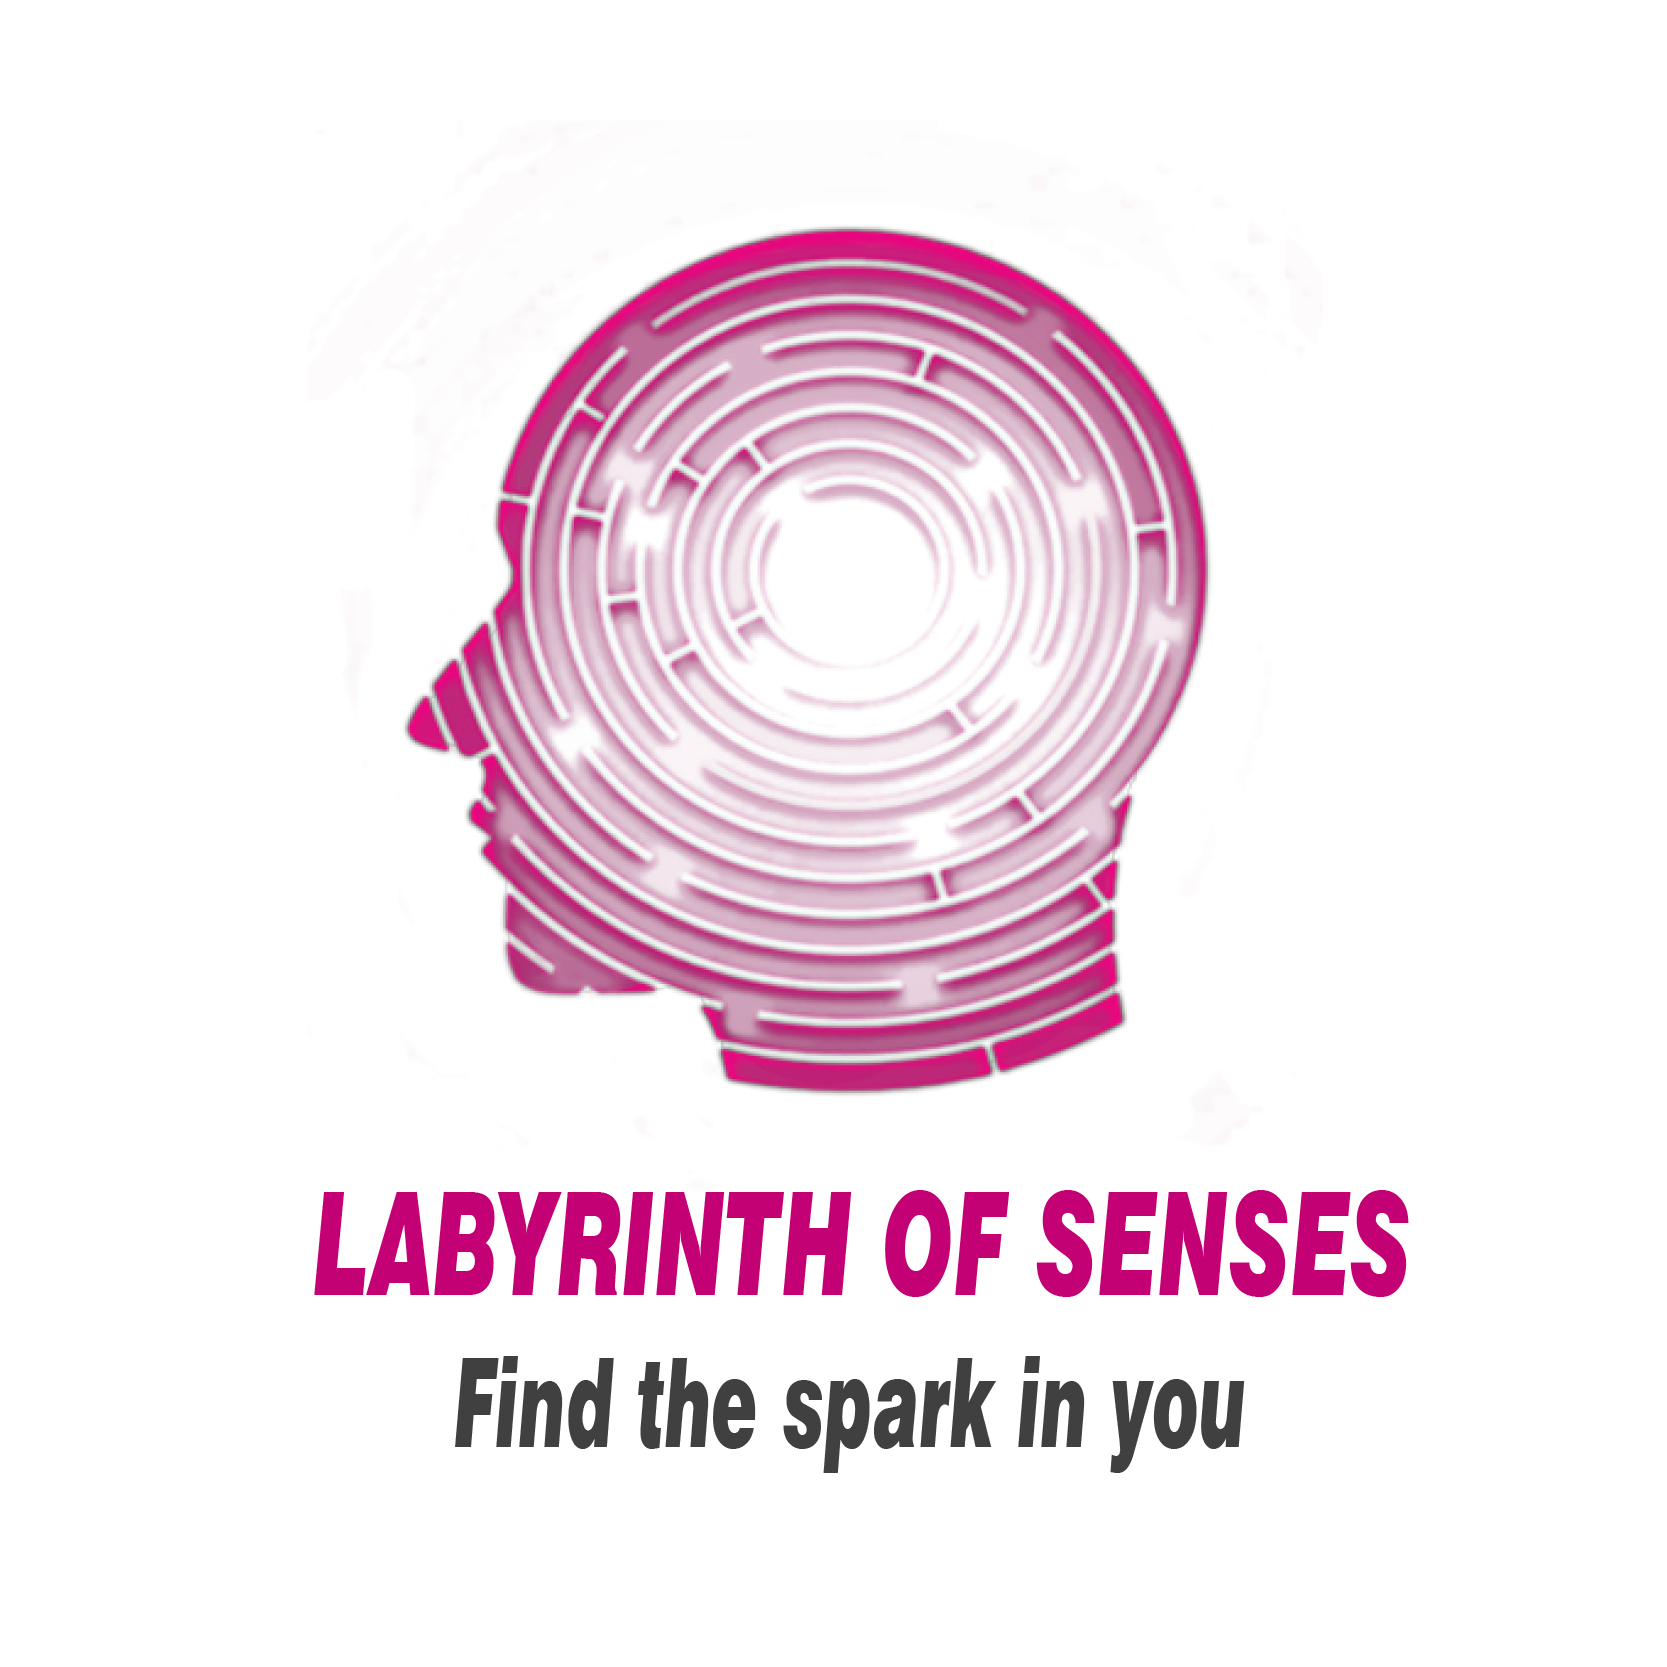 Labyrinth of Senses